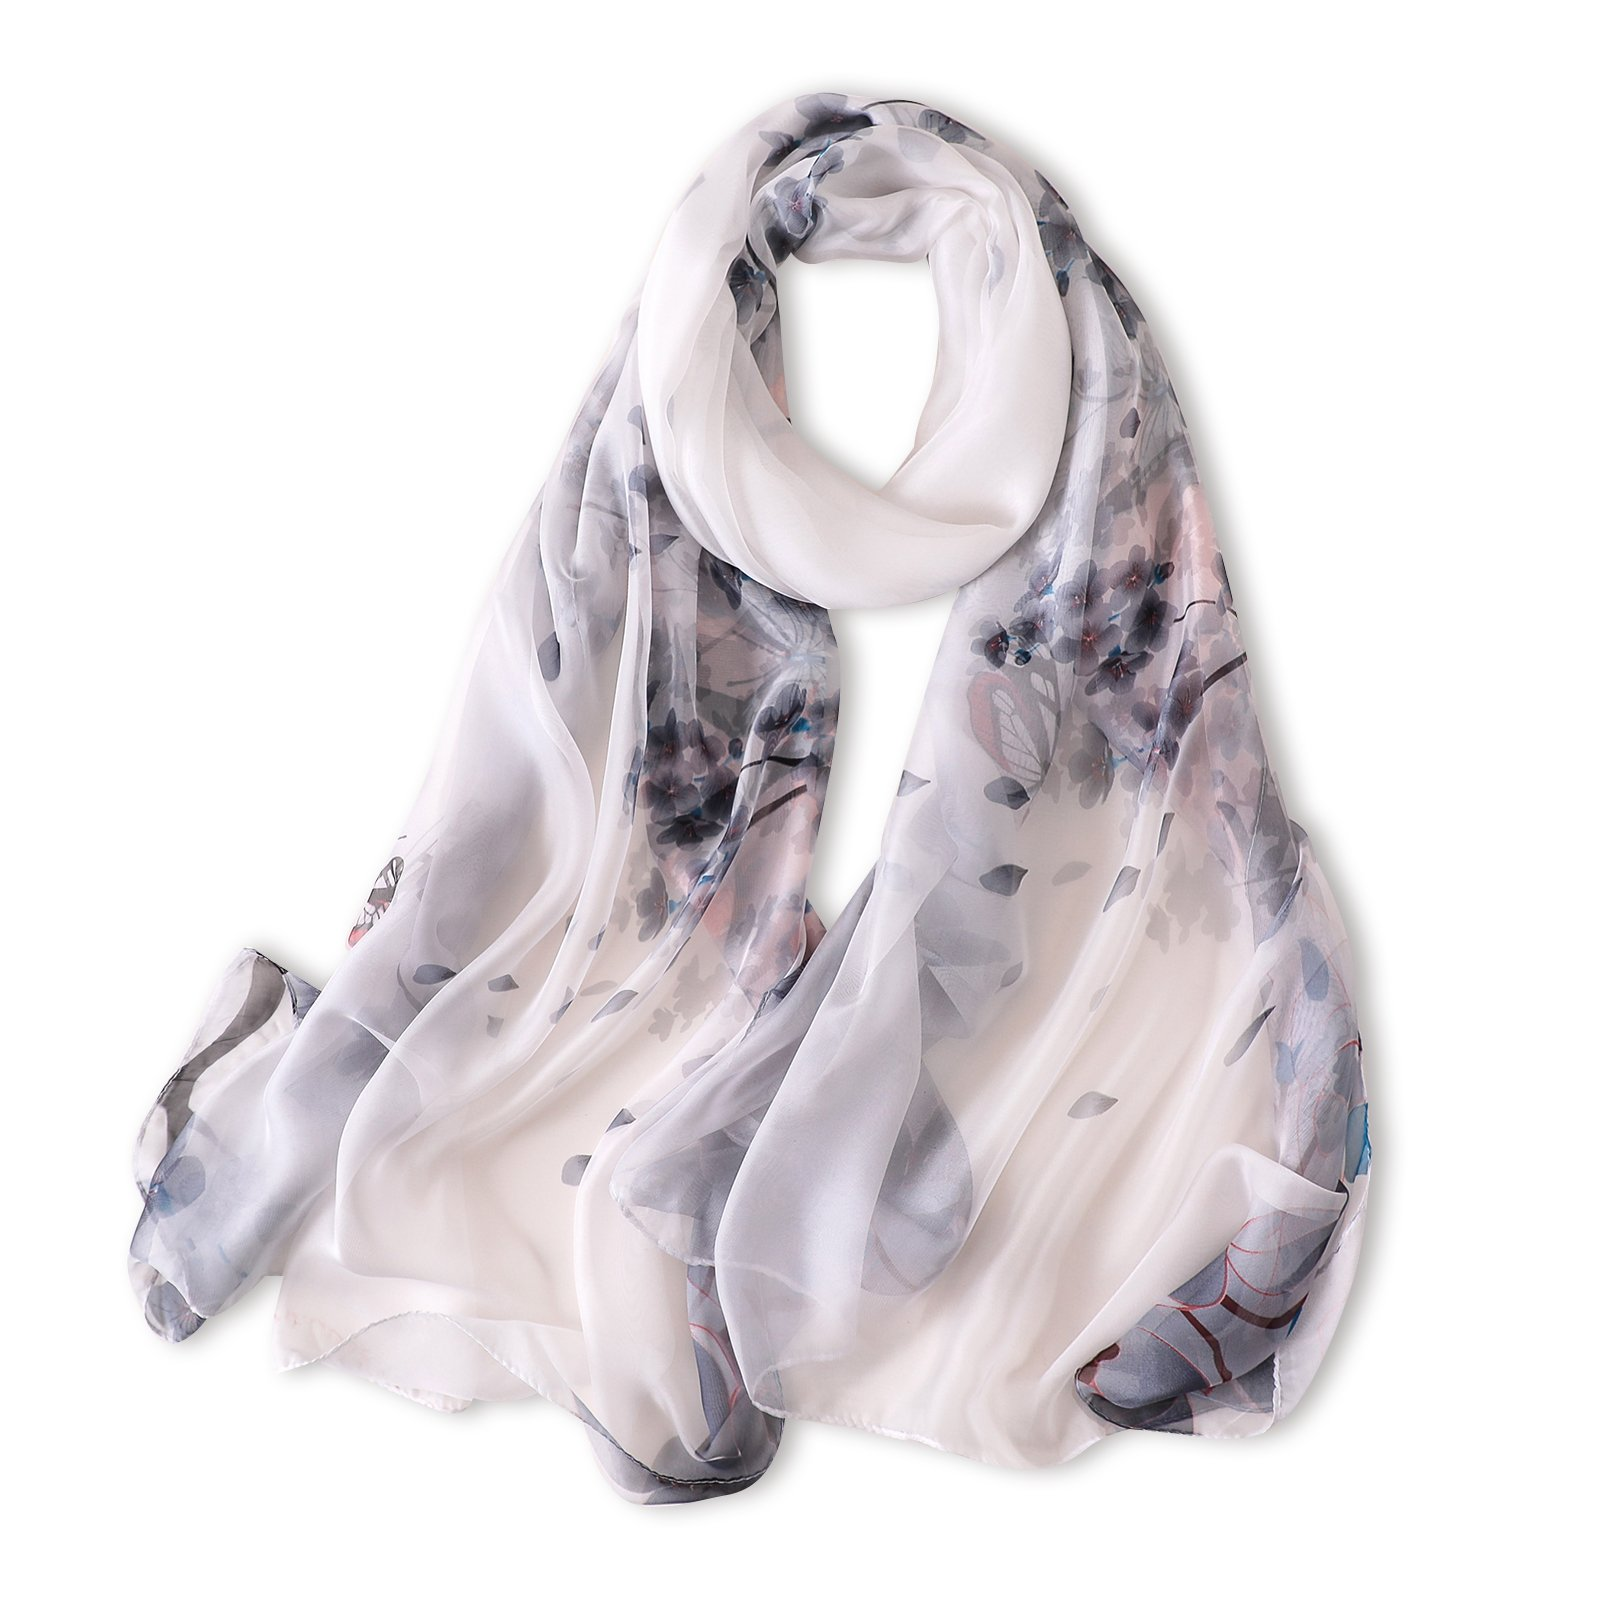 Women's Silk Feeling Scraf Ladys Summer Long Shawl Wrap Pashmina Beach Stoles Hijab (Pattern K C04)